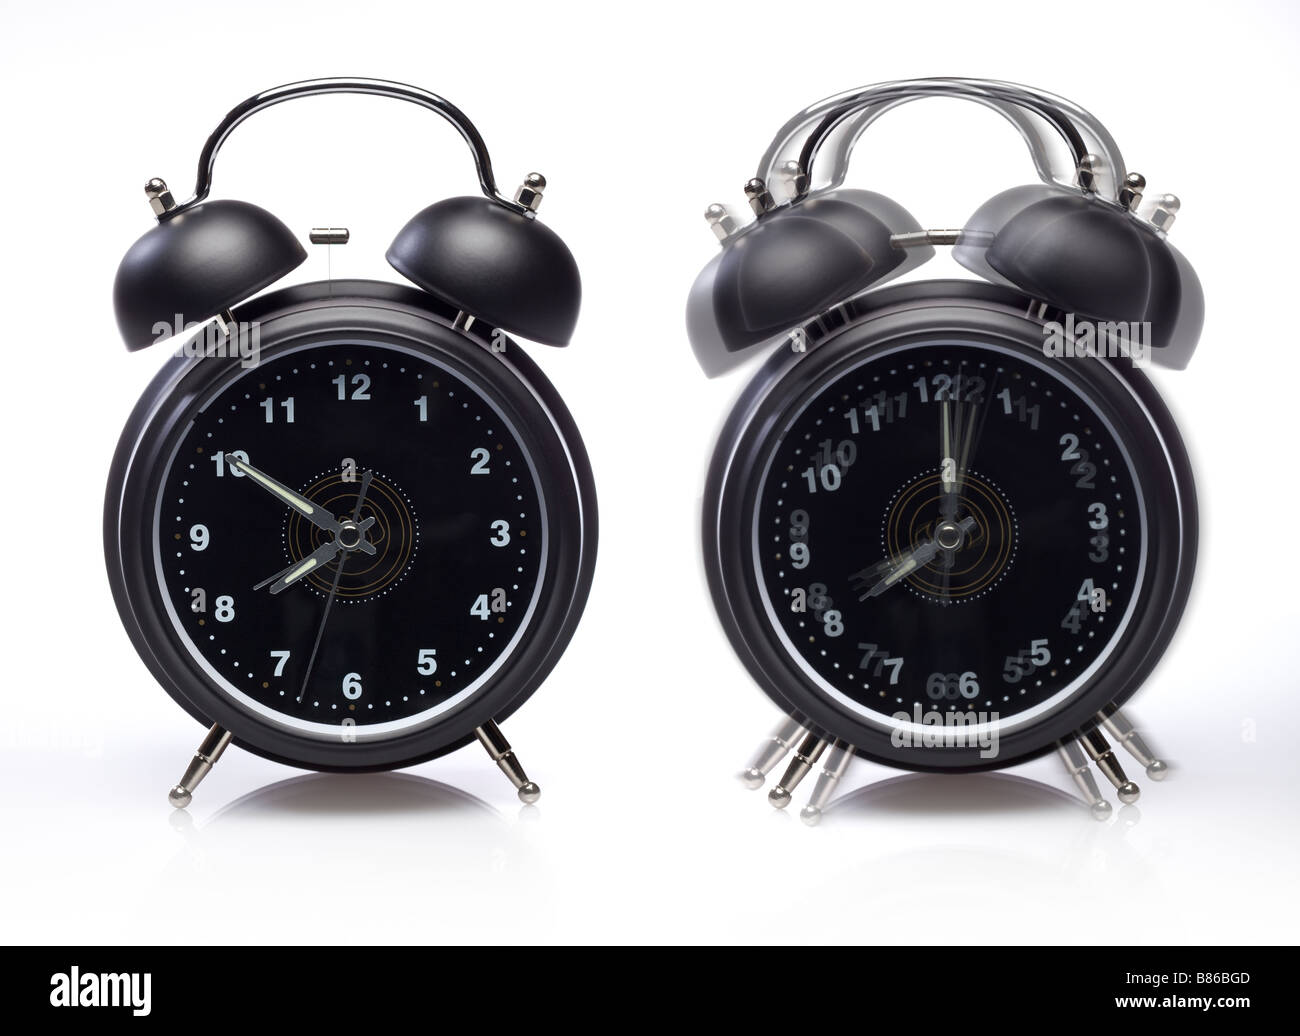 Two alarm clocks one still one ringing on white - Stock Image